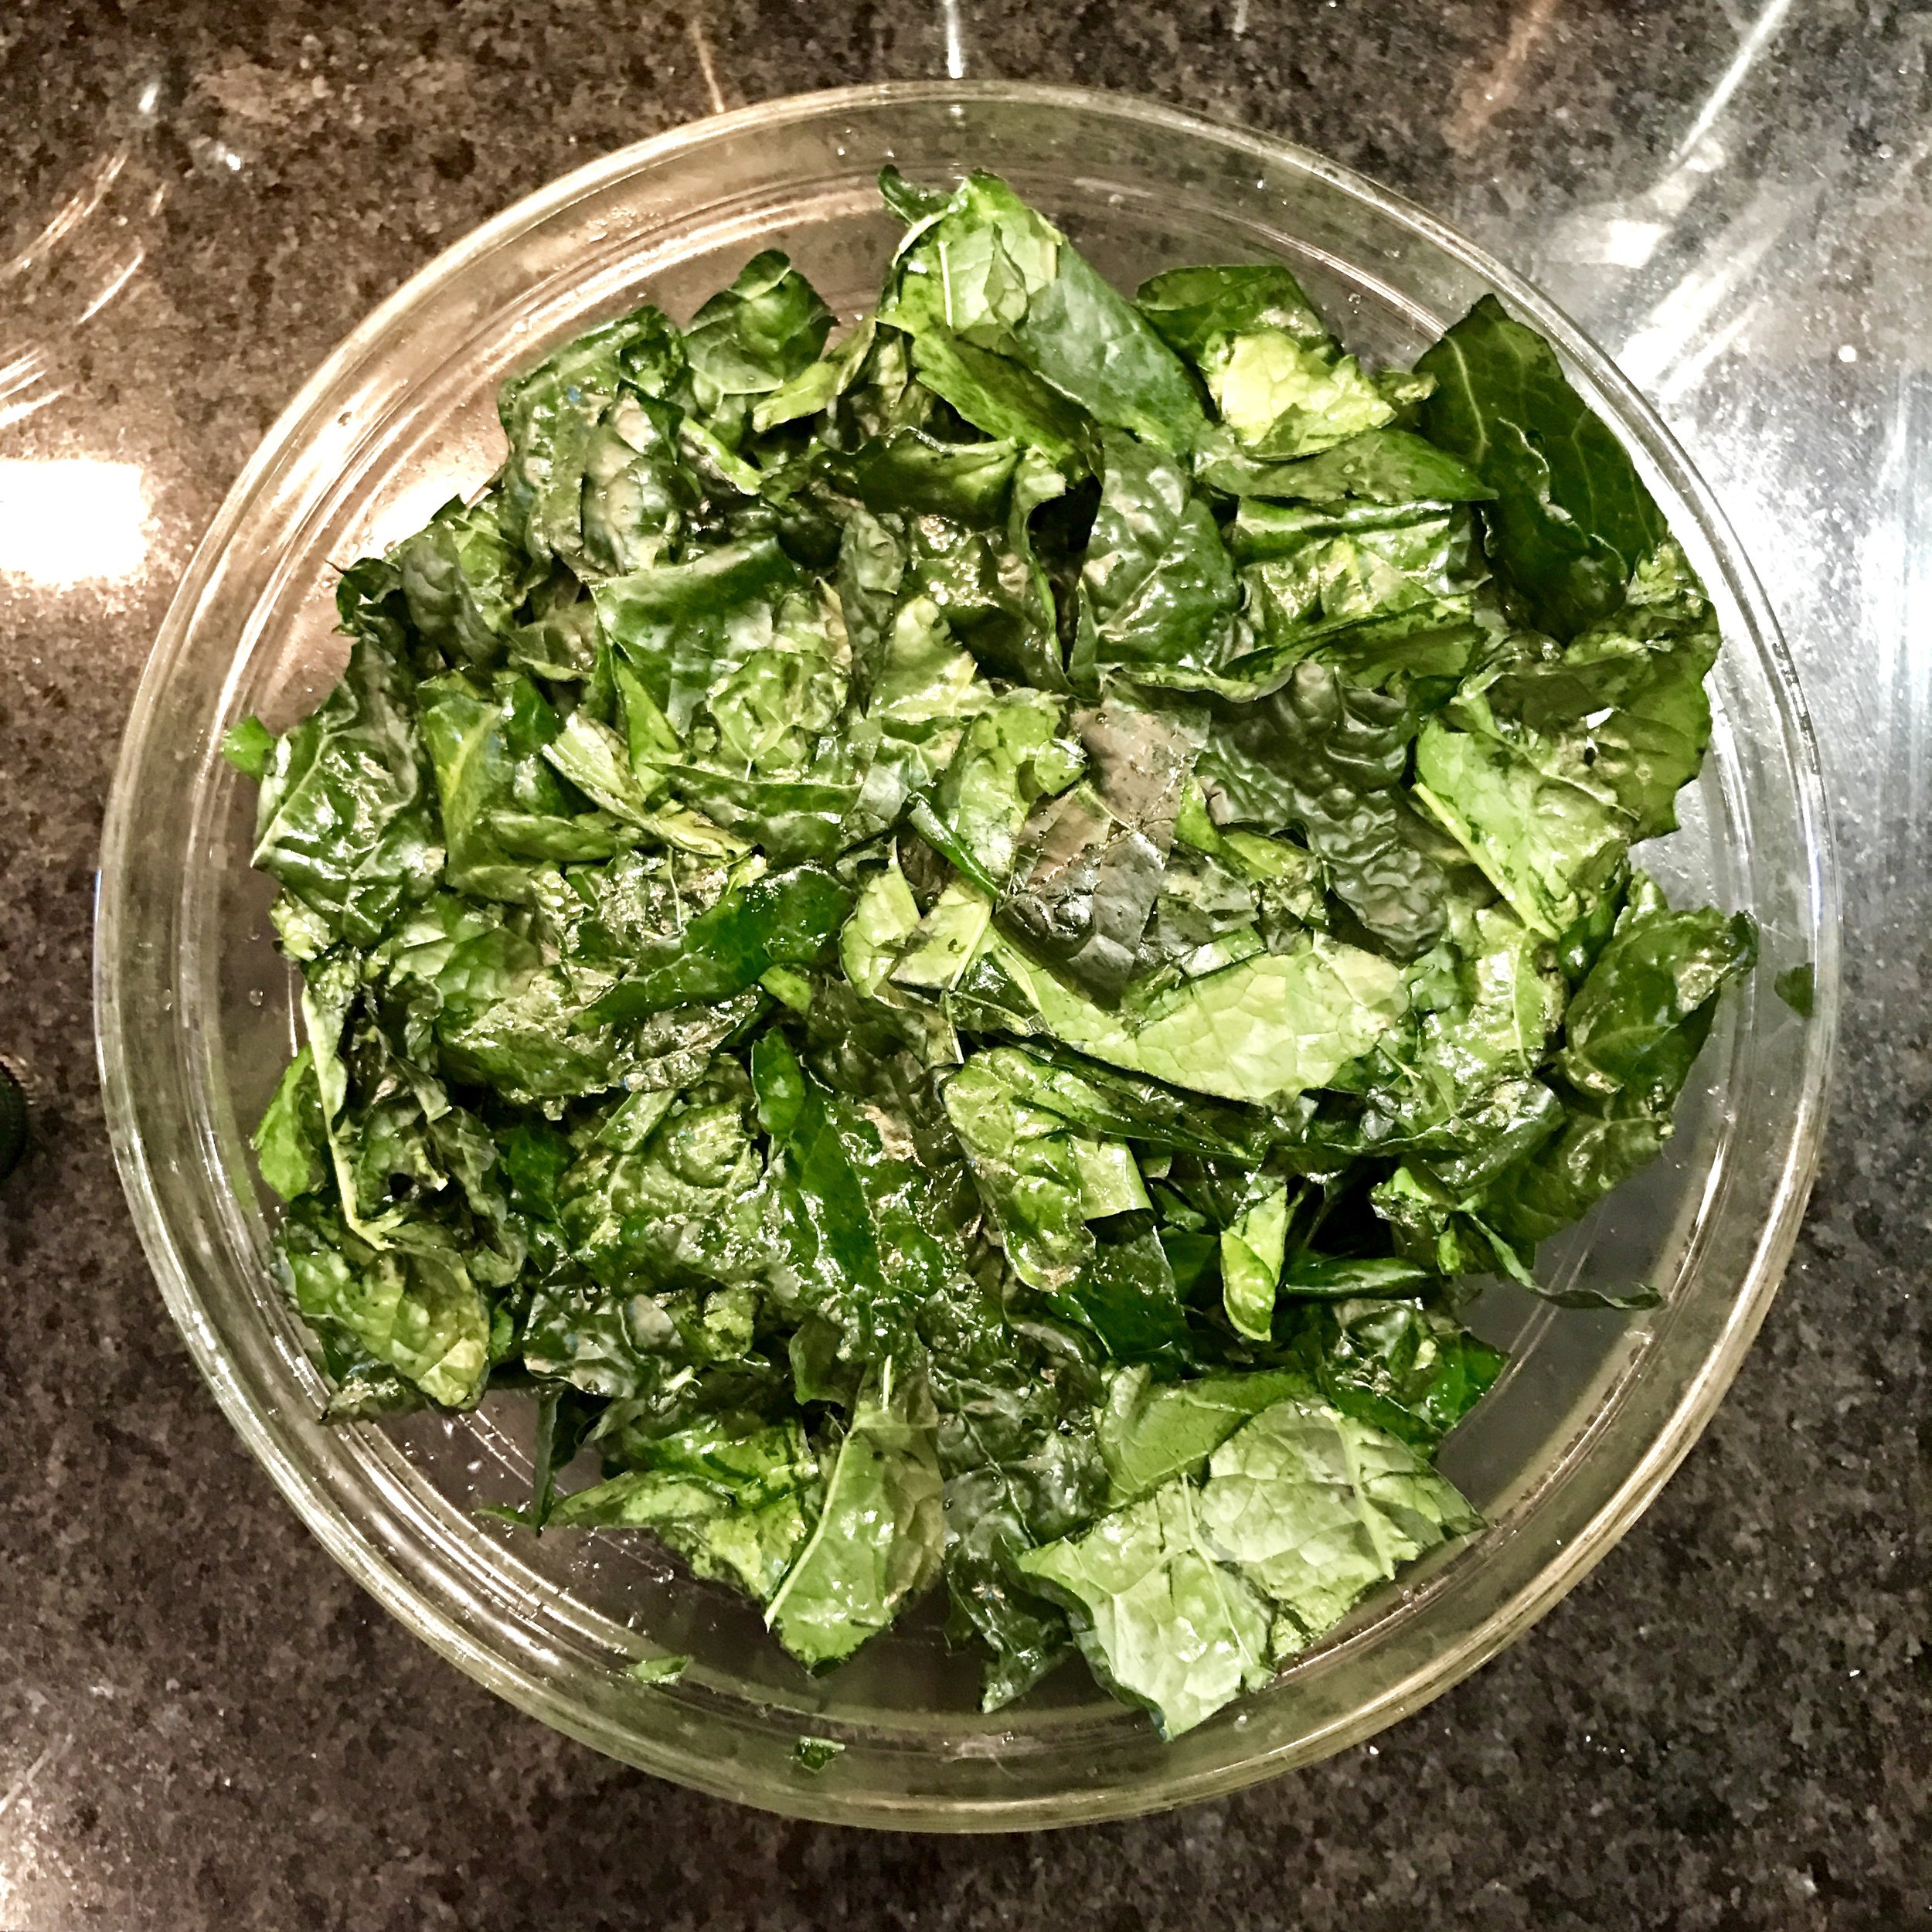 tenderized kale - sunny side kale goodness - www.newtritionny.com